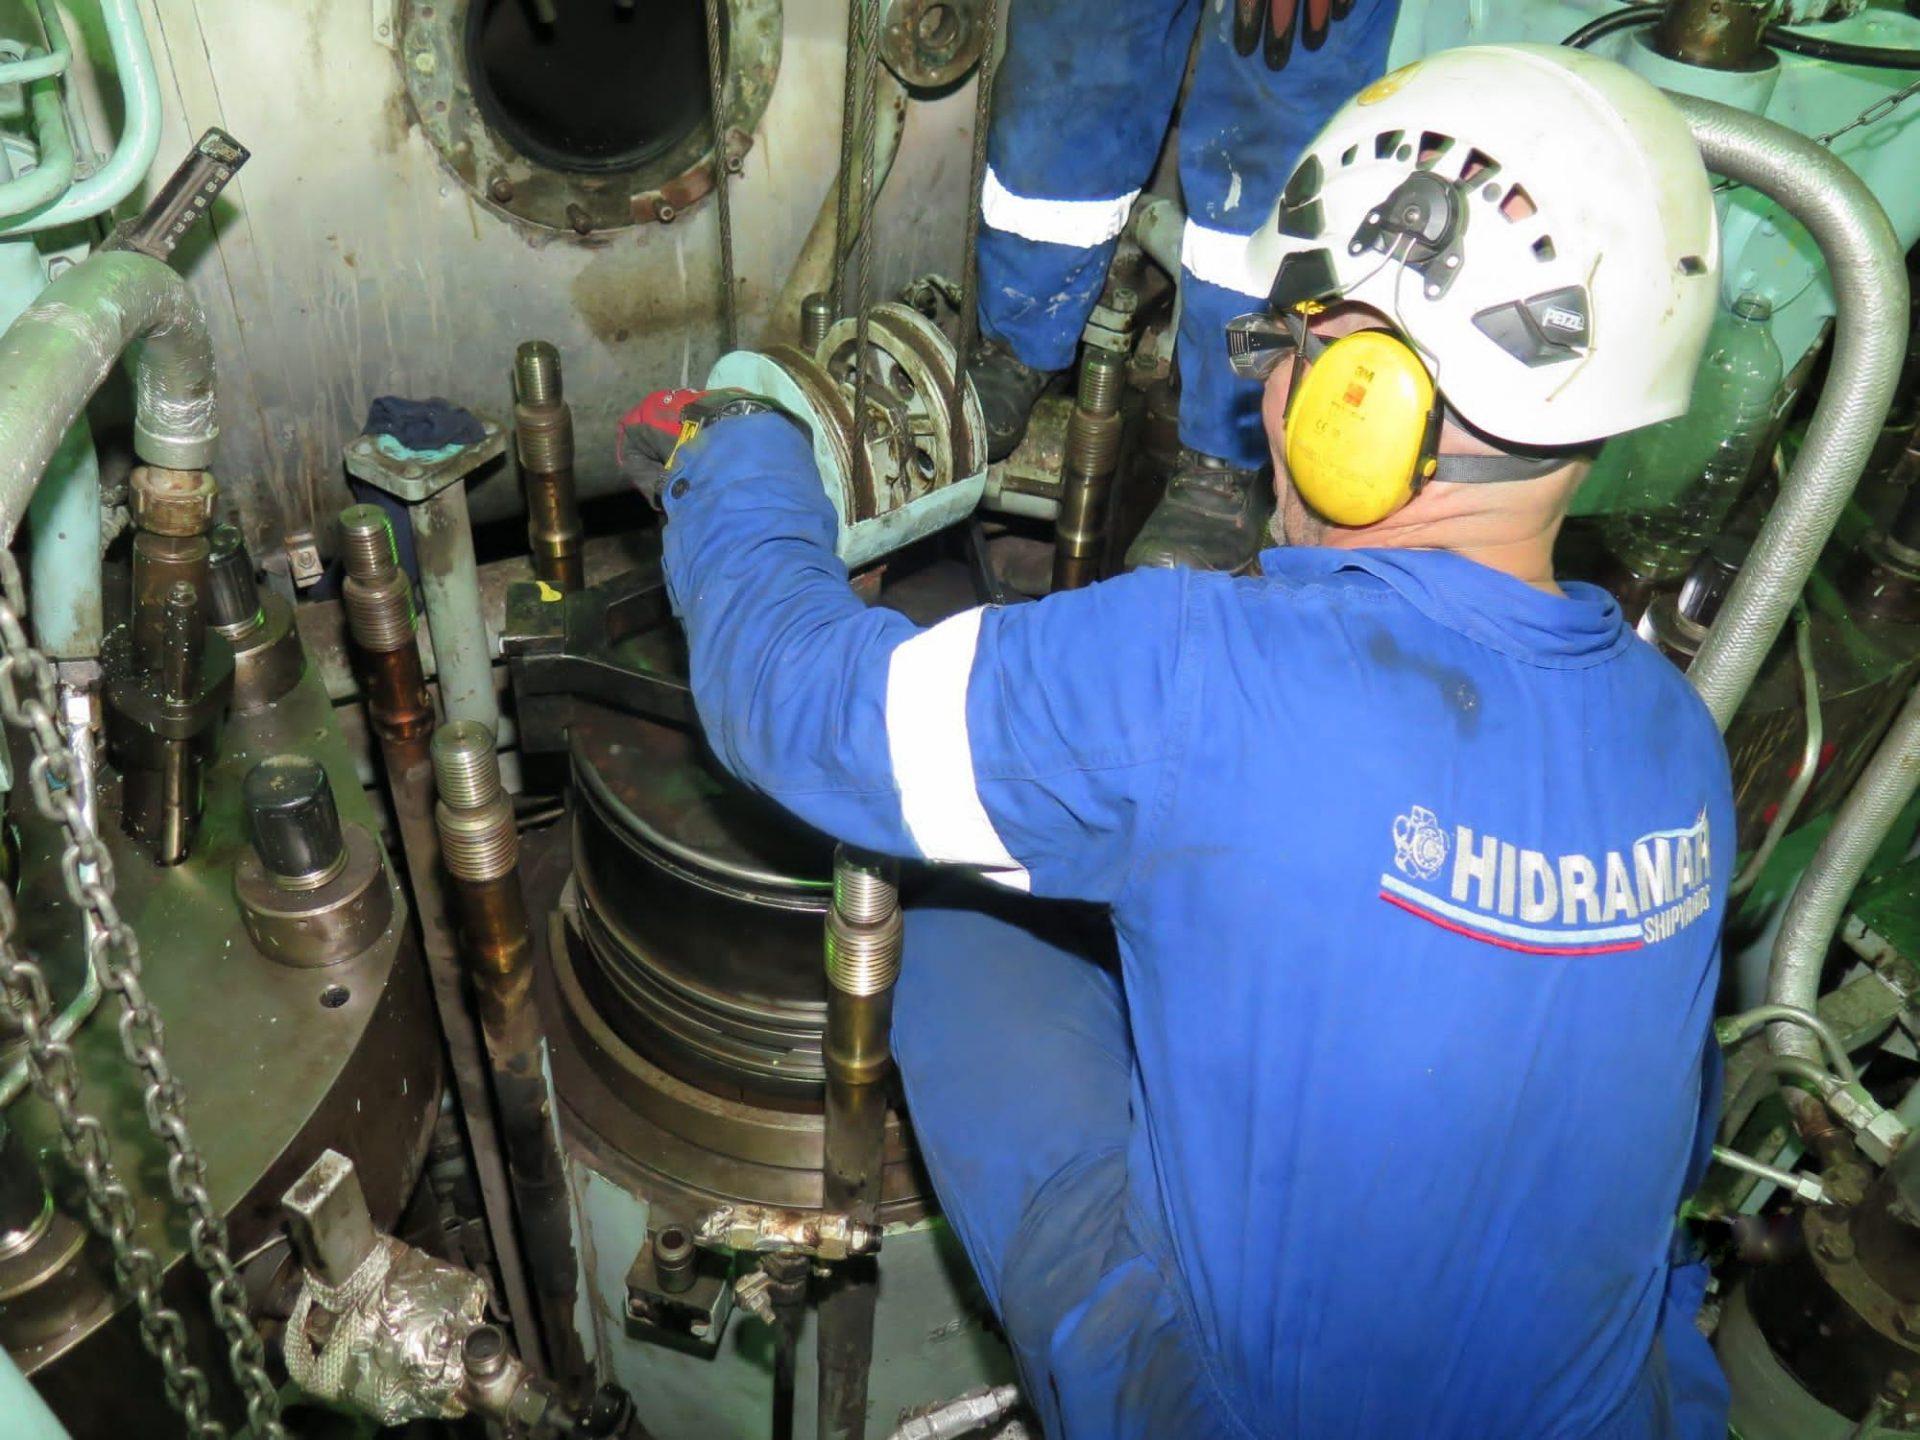 Icarius Main engine hoverhauling service